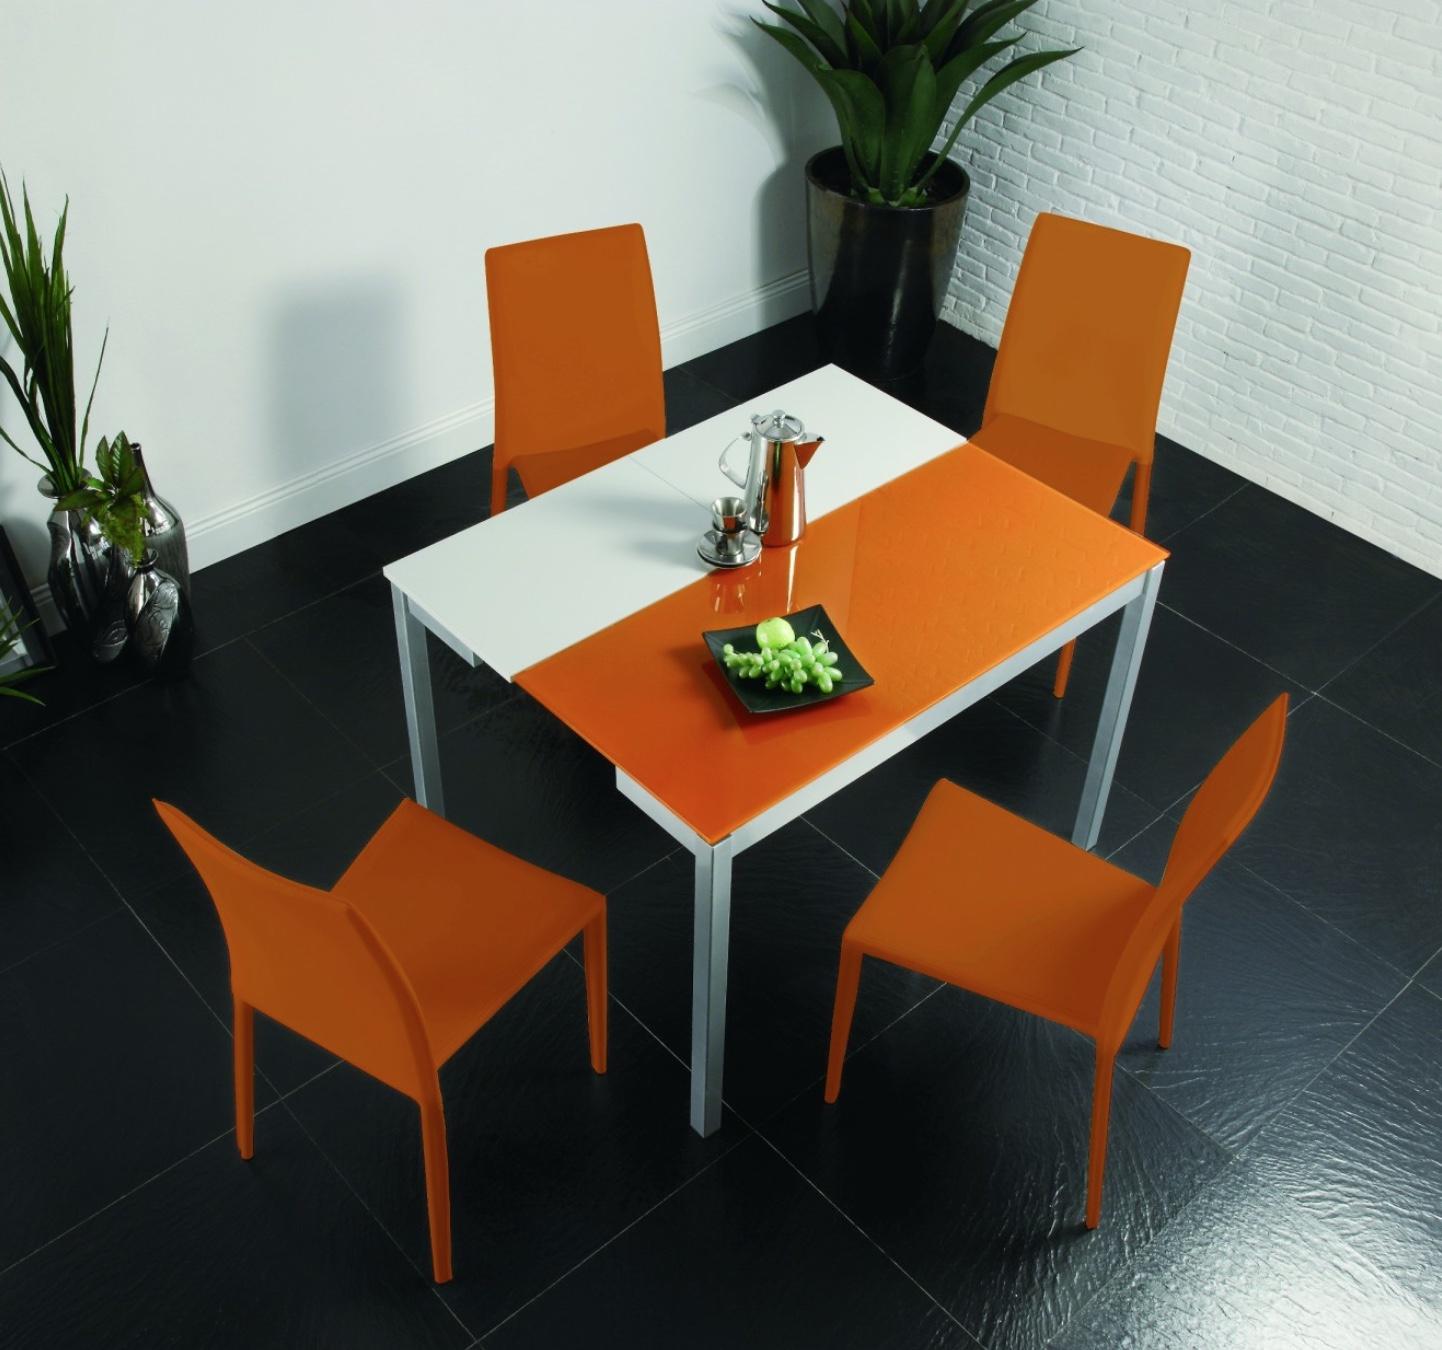 Orlando Table By Creative Creative Furniture Usa